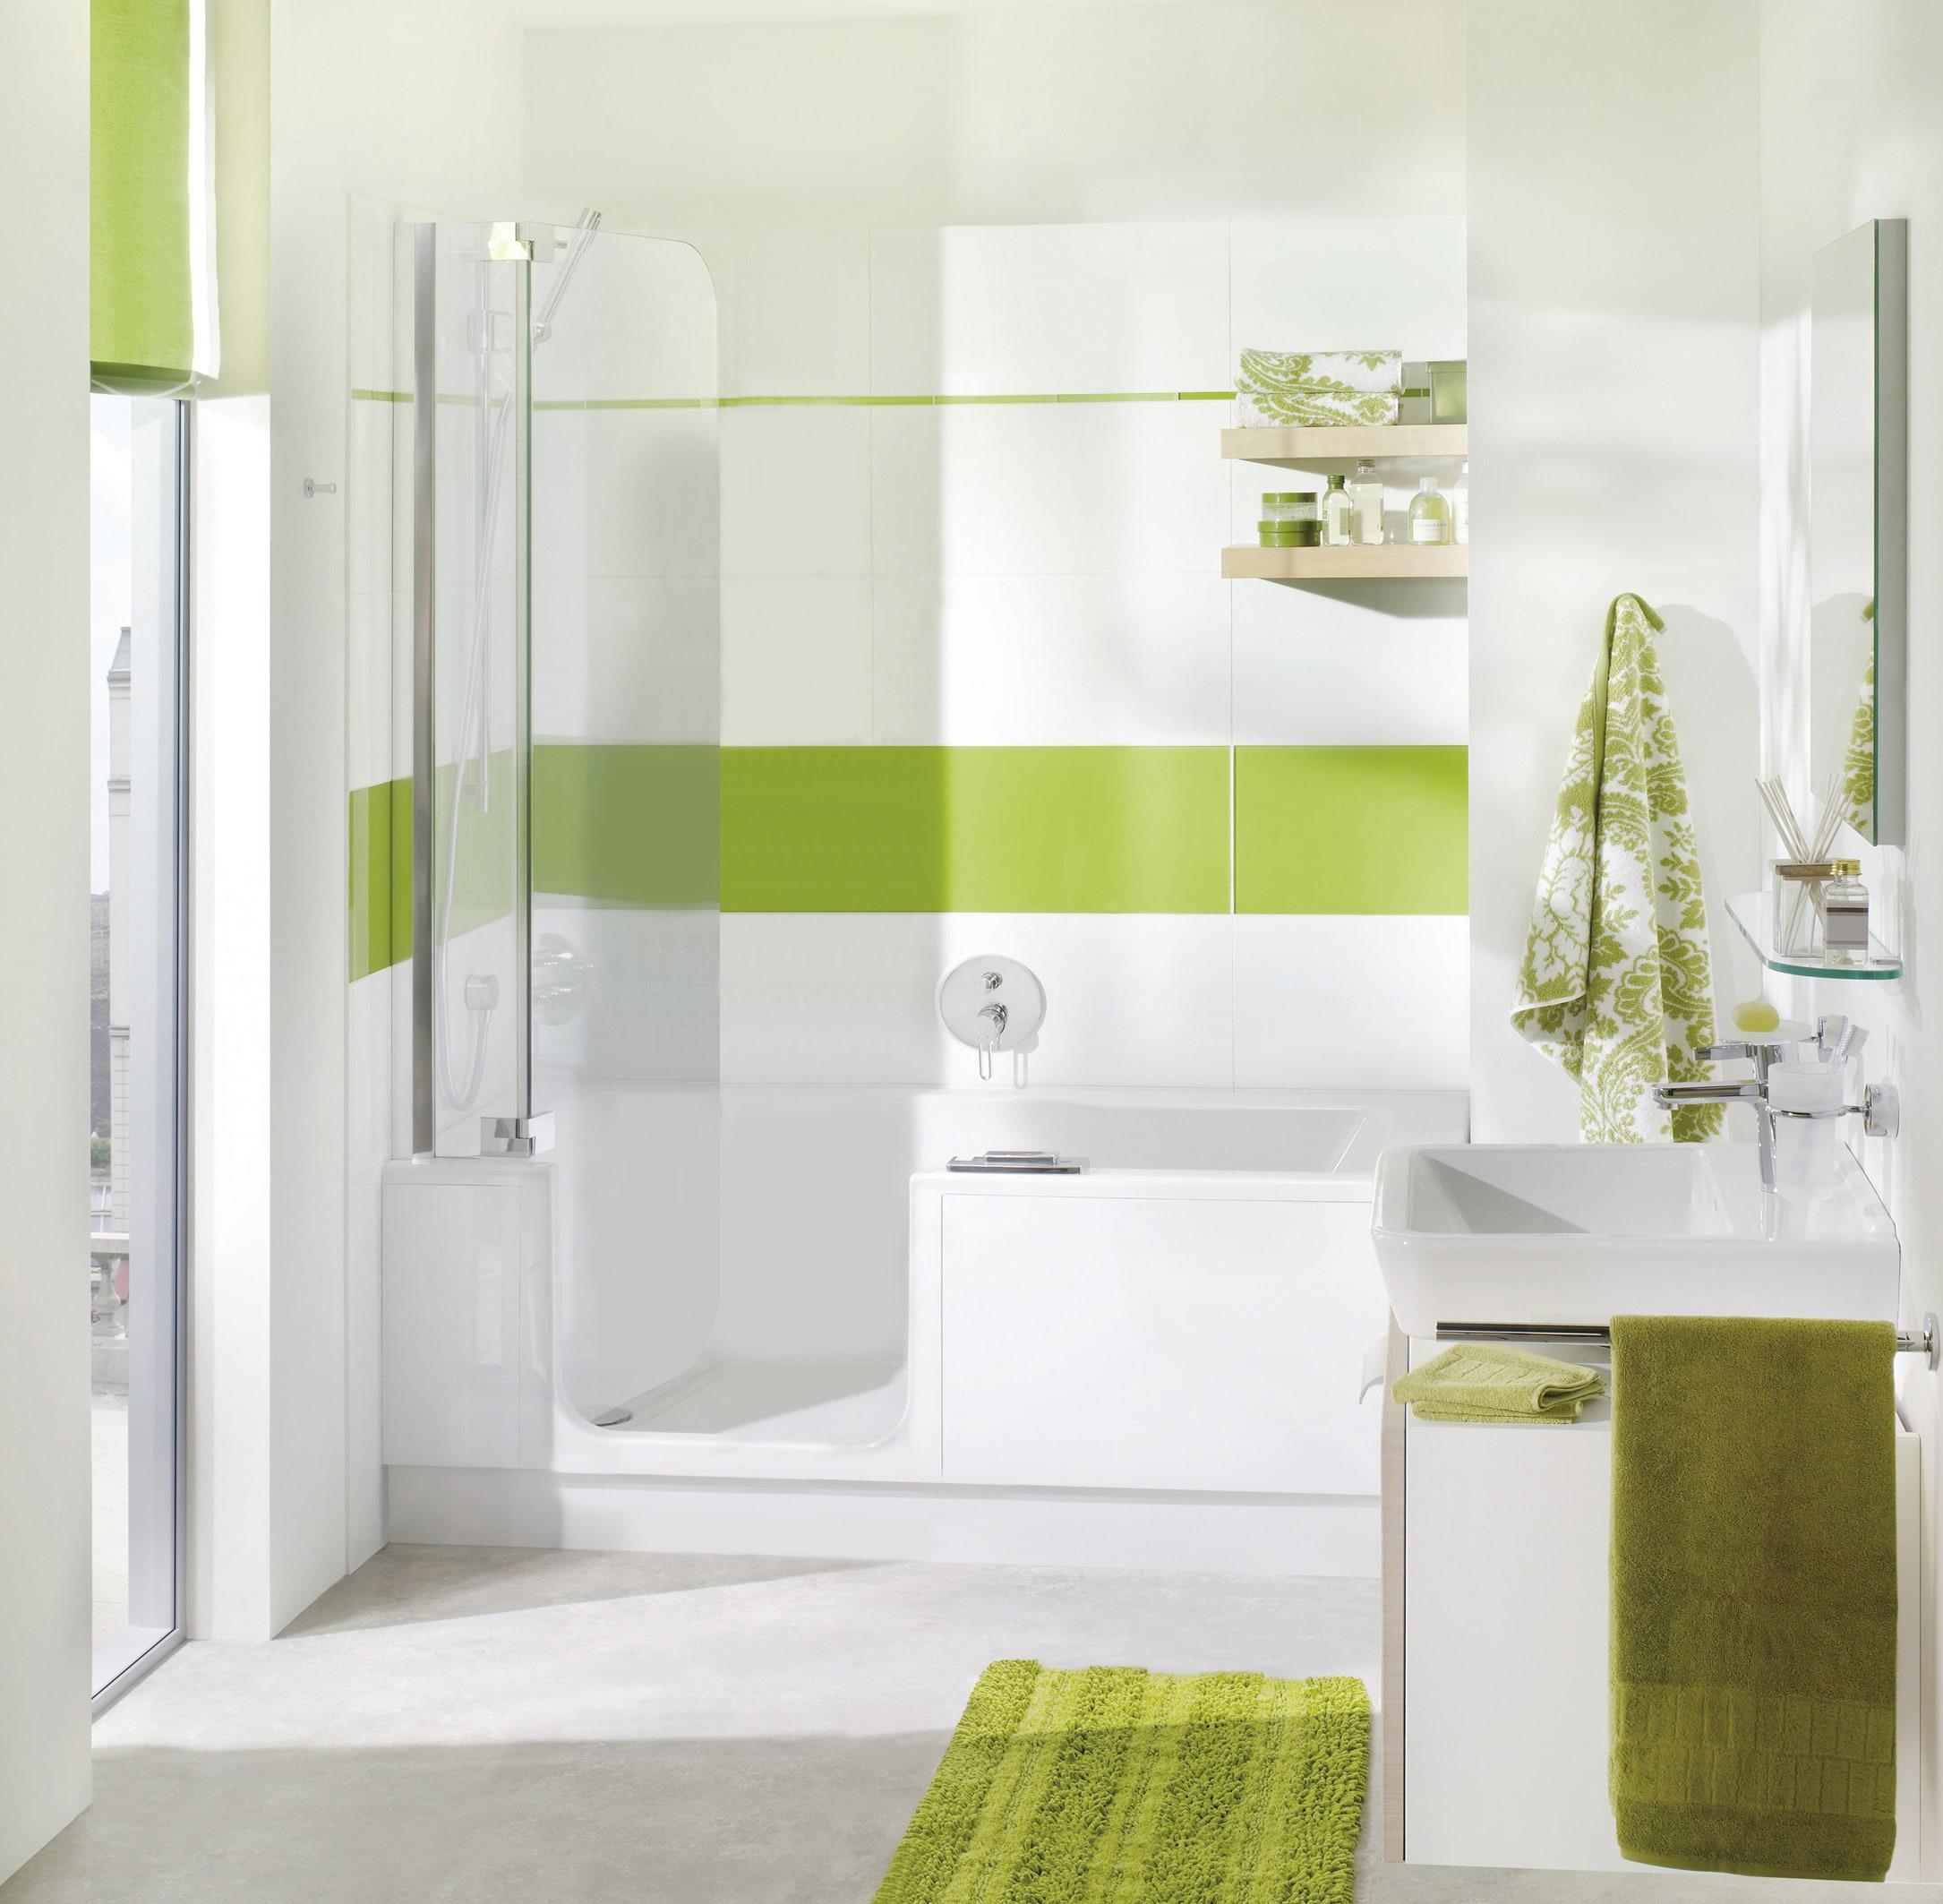 Acryline TL60 Twinline Bathtub And Showering Unit-alcove ...